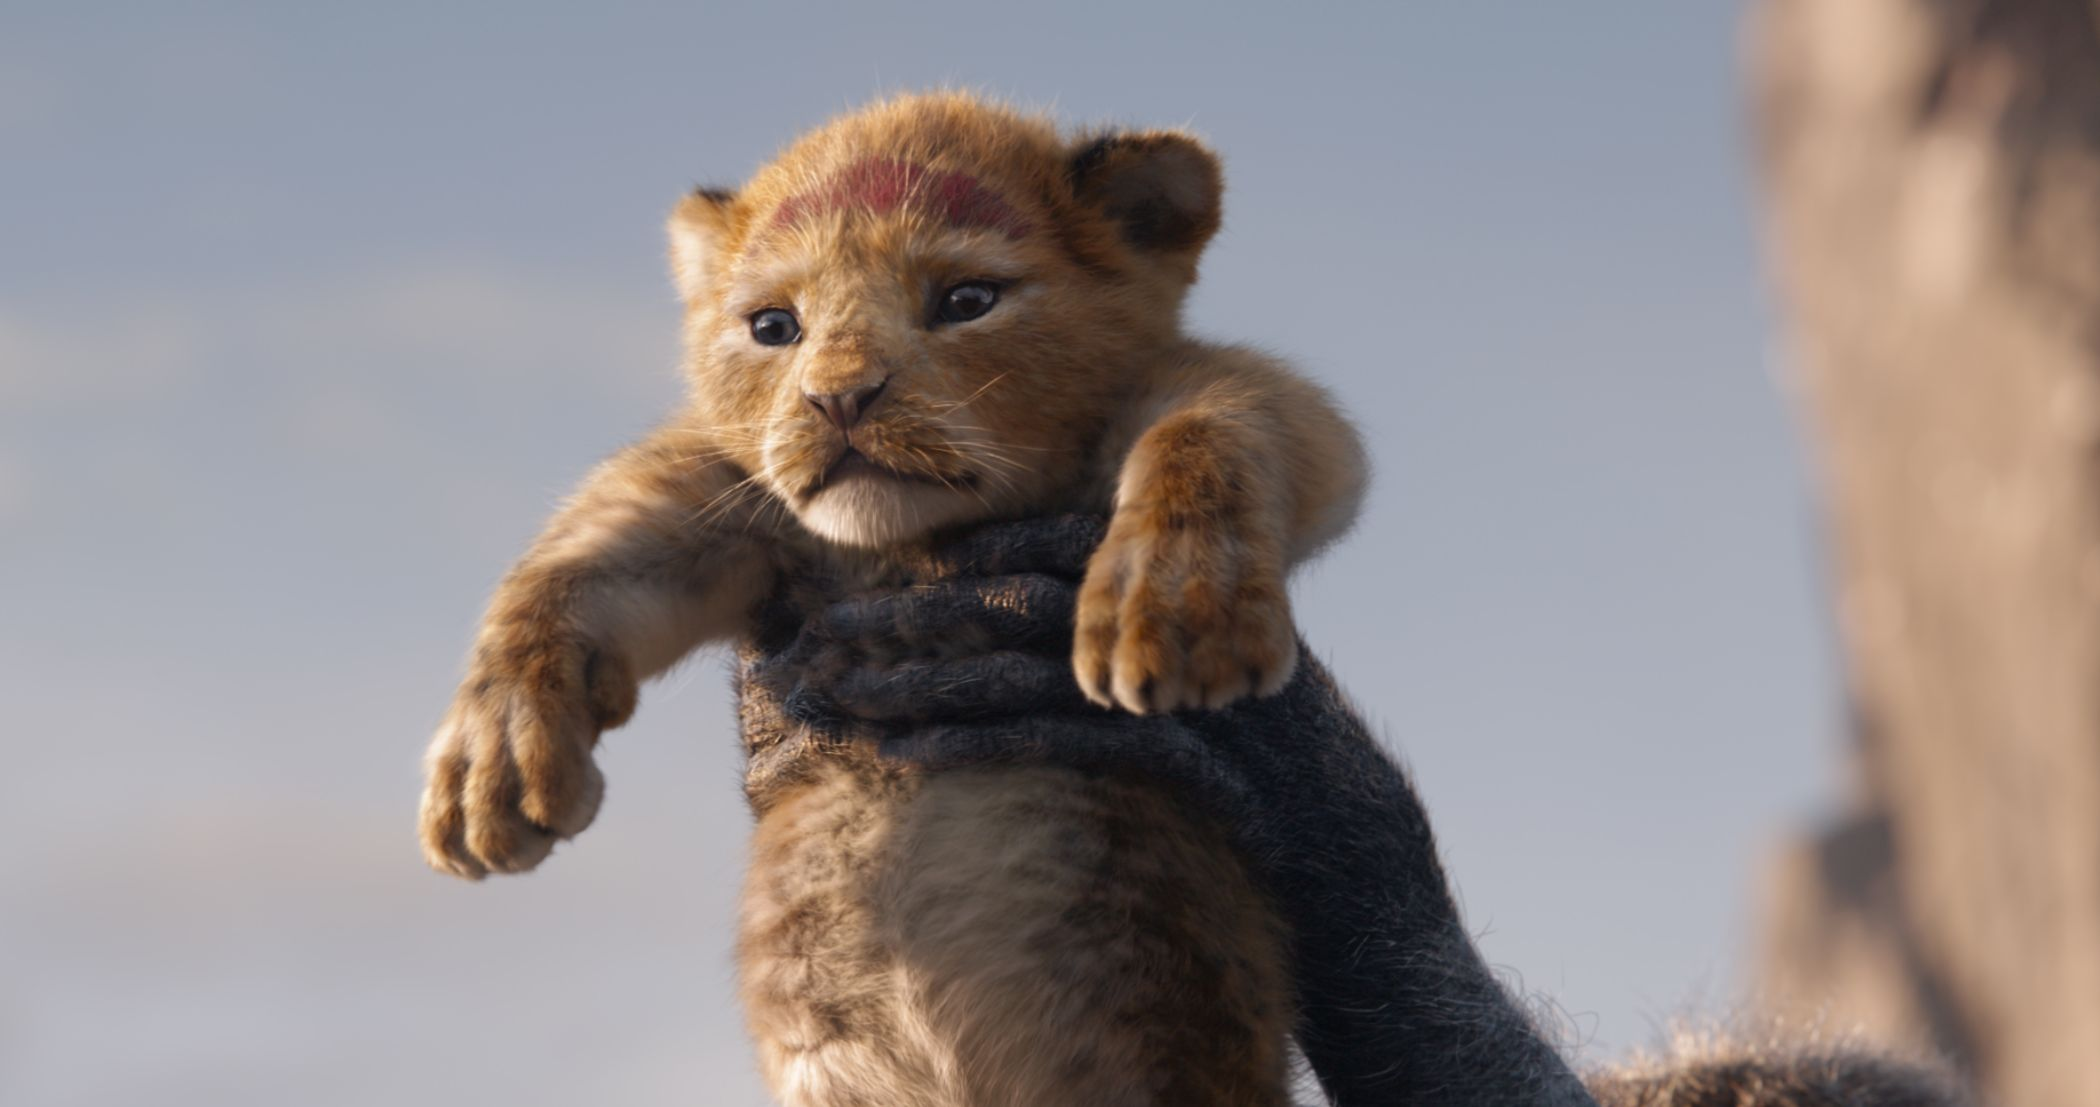 The-Lion-King_dt1_still_1 1.jpg